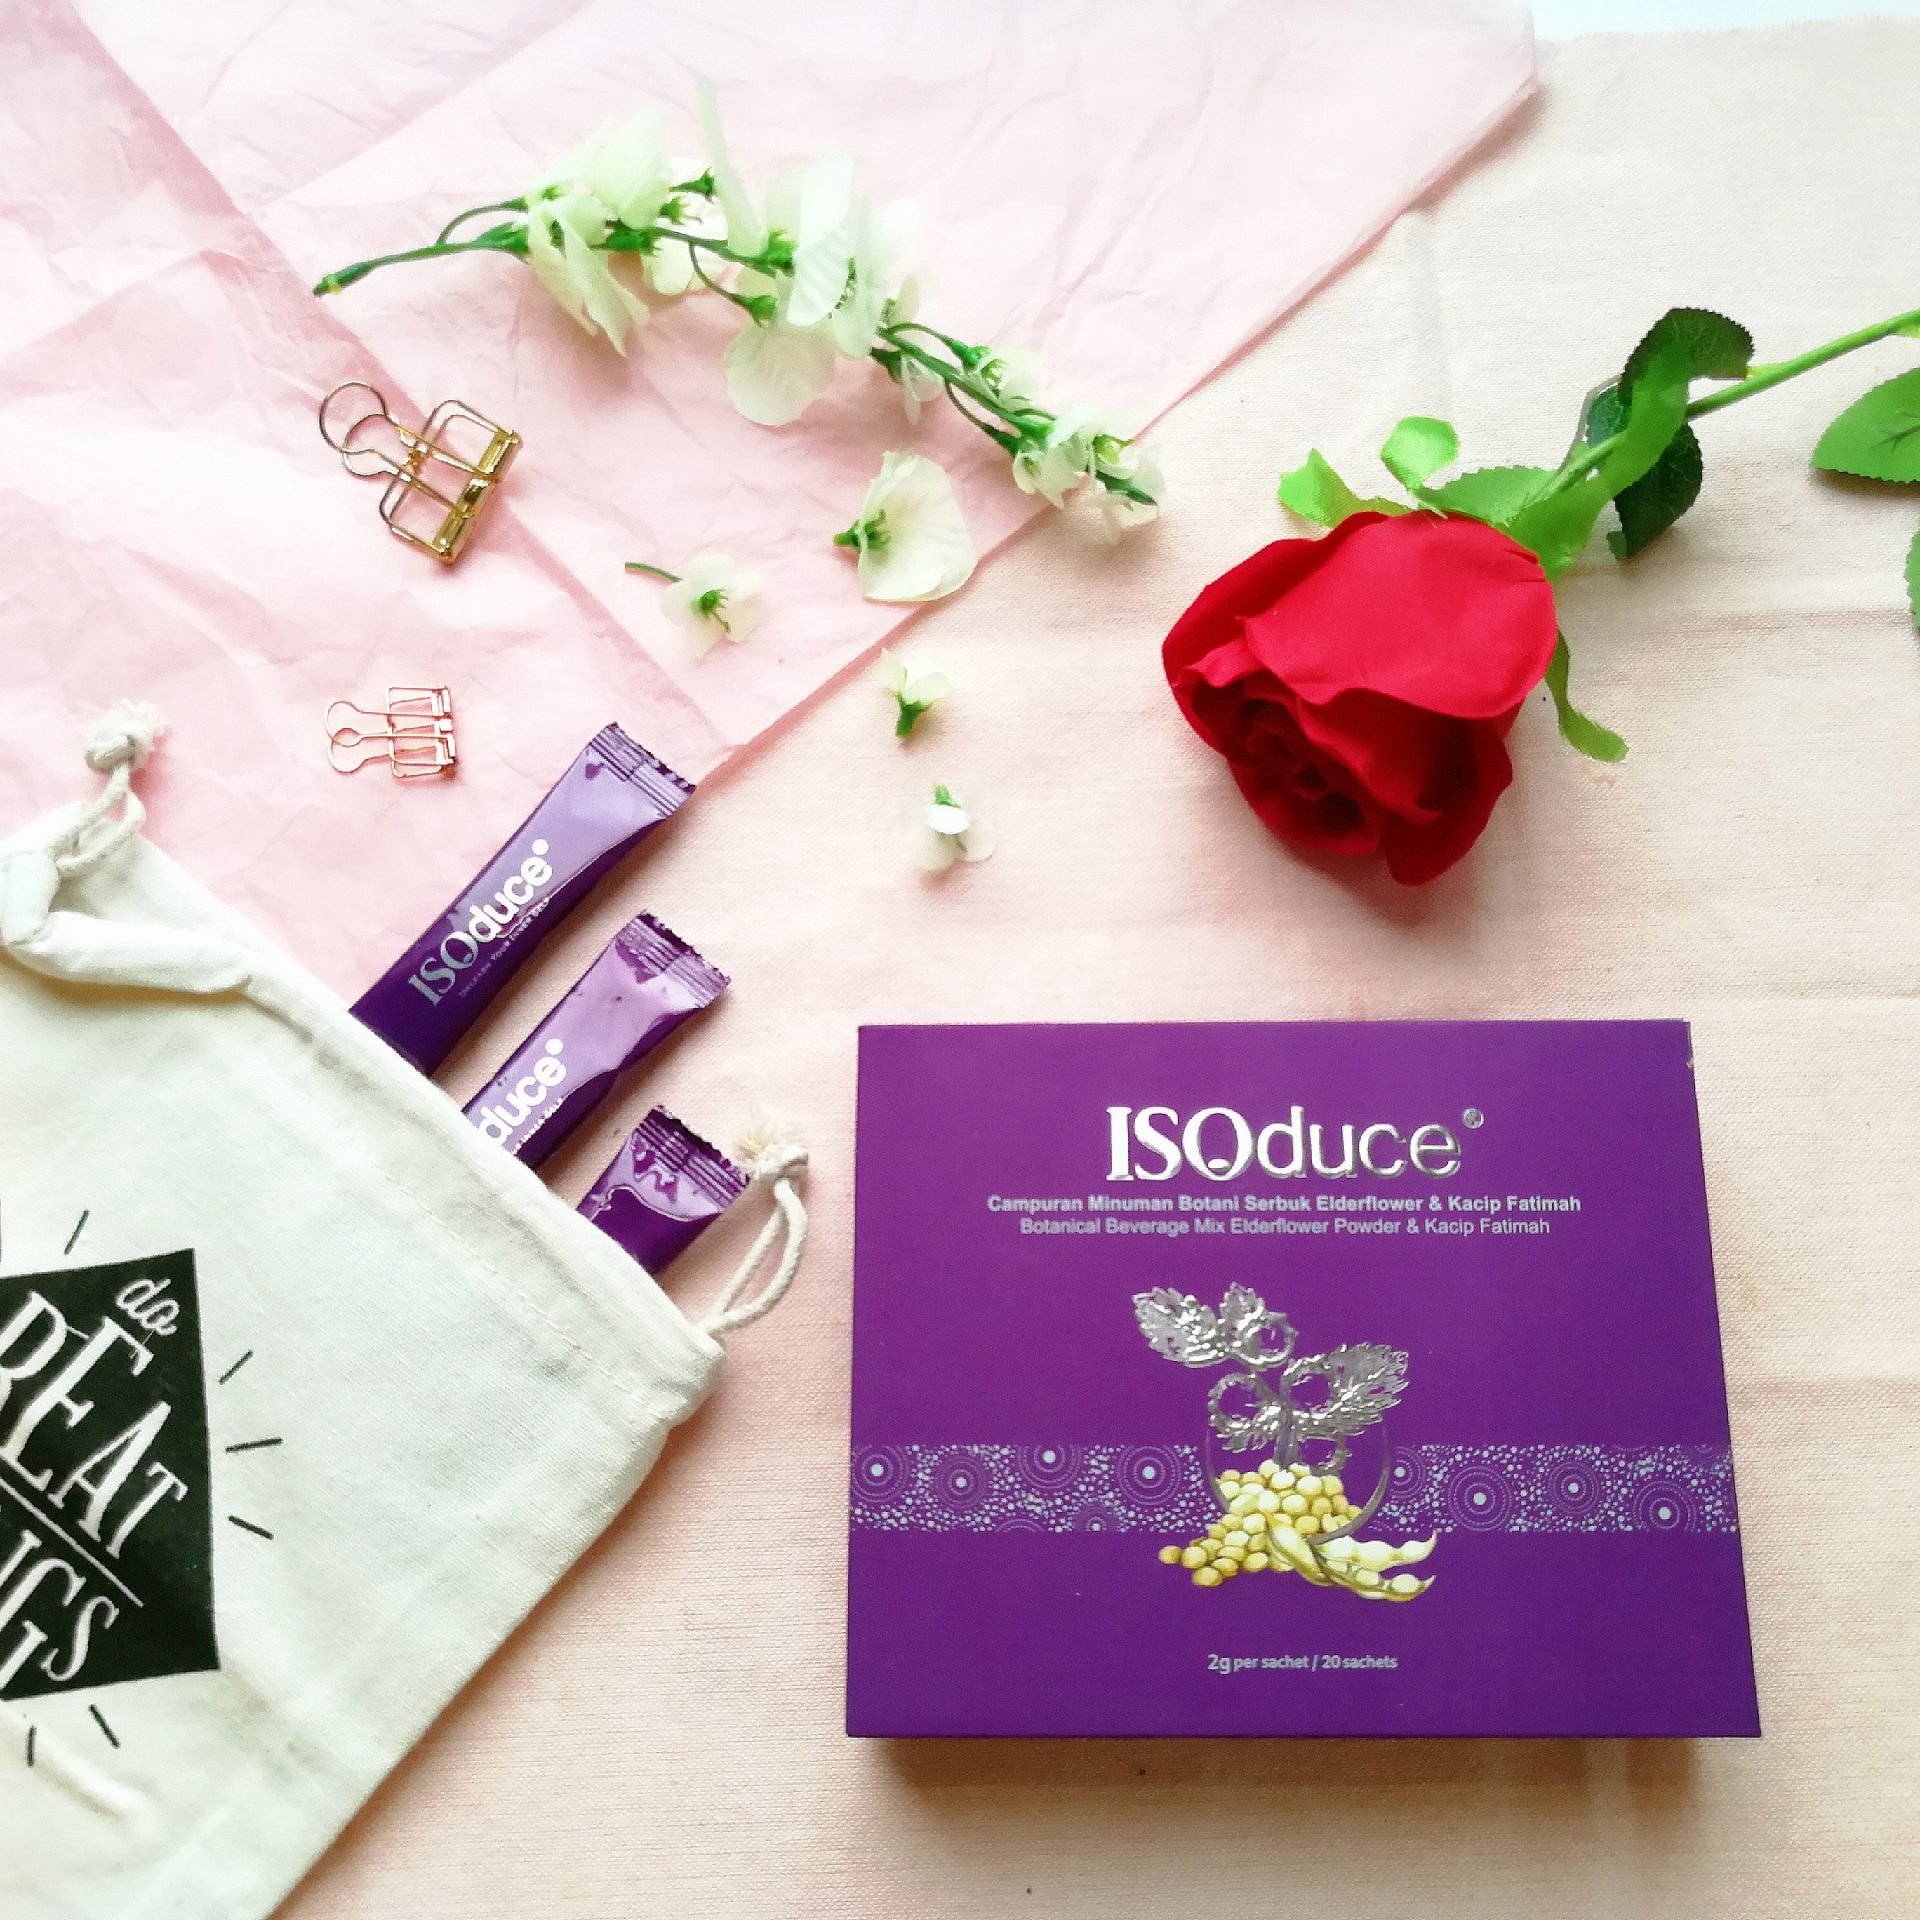 Wellous Singapore Isoduce Women's hormones especially estrogen-24